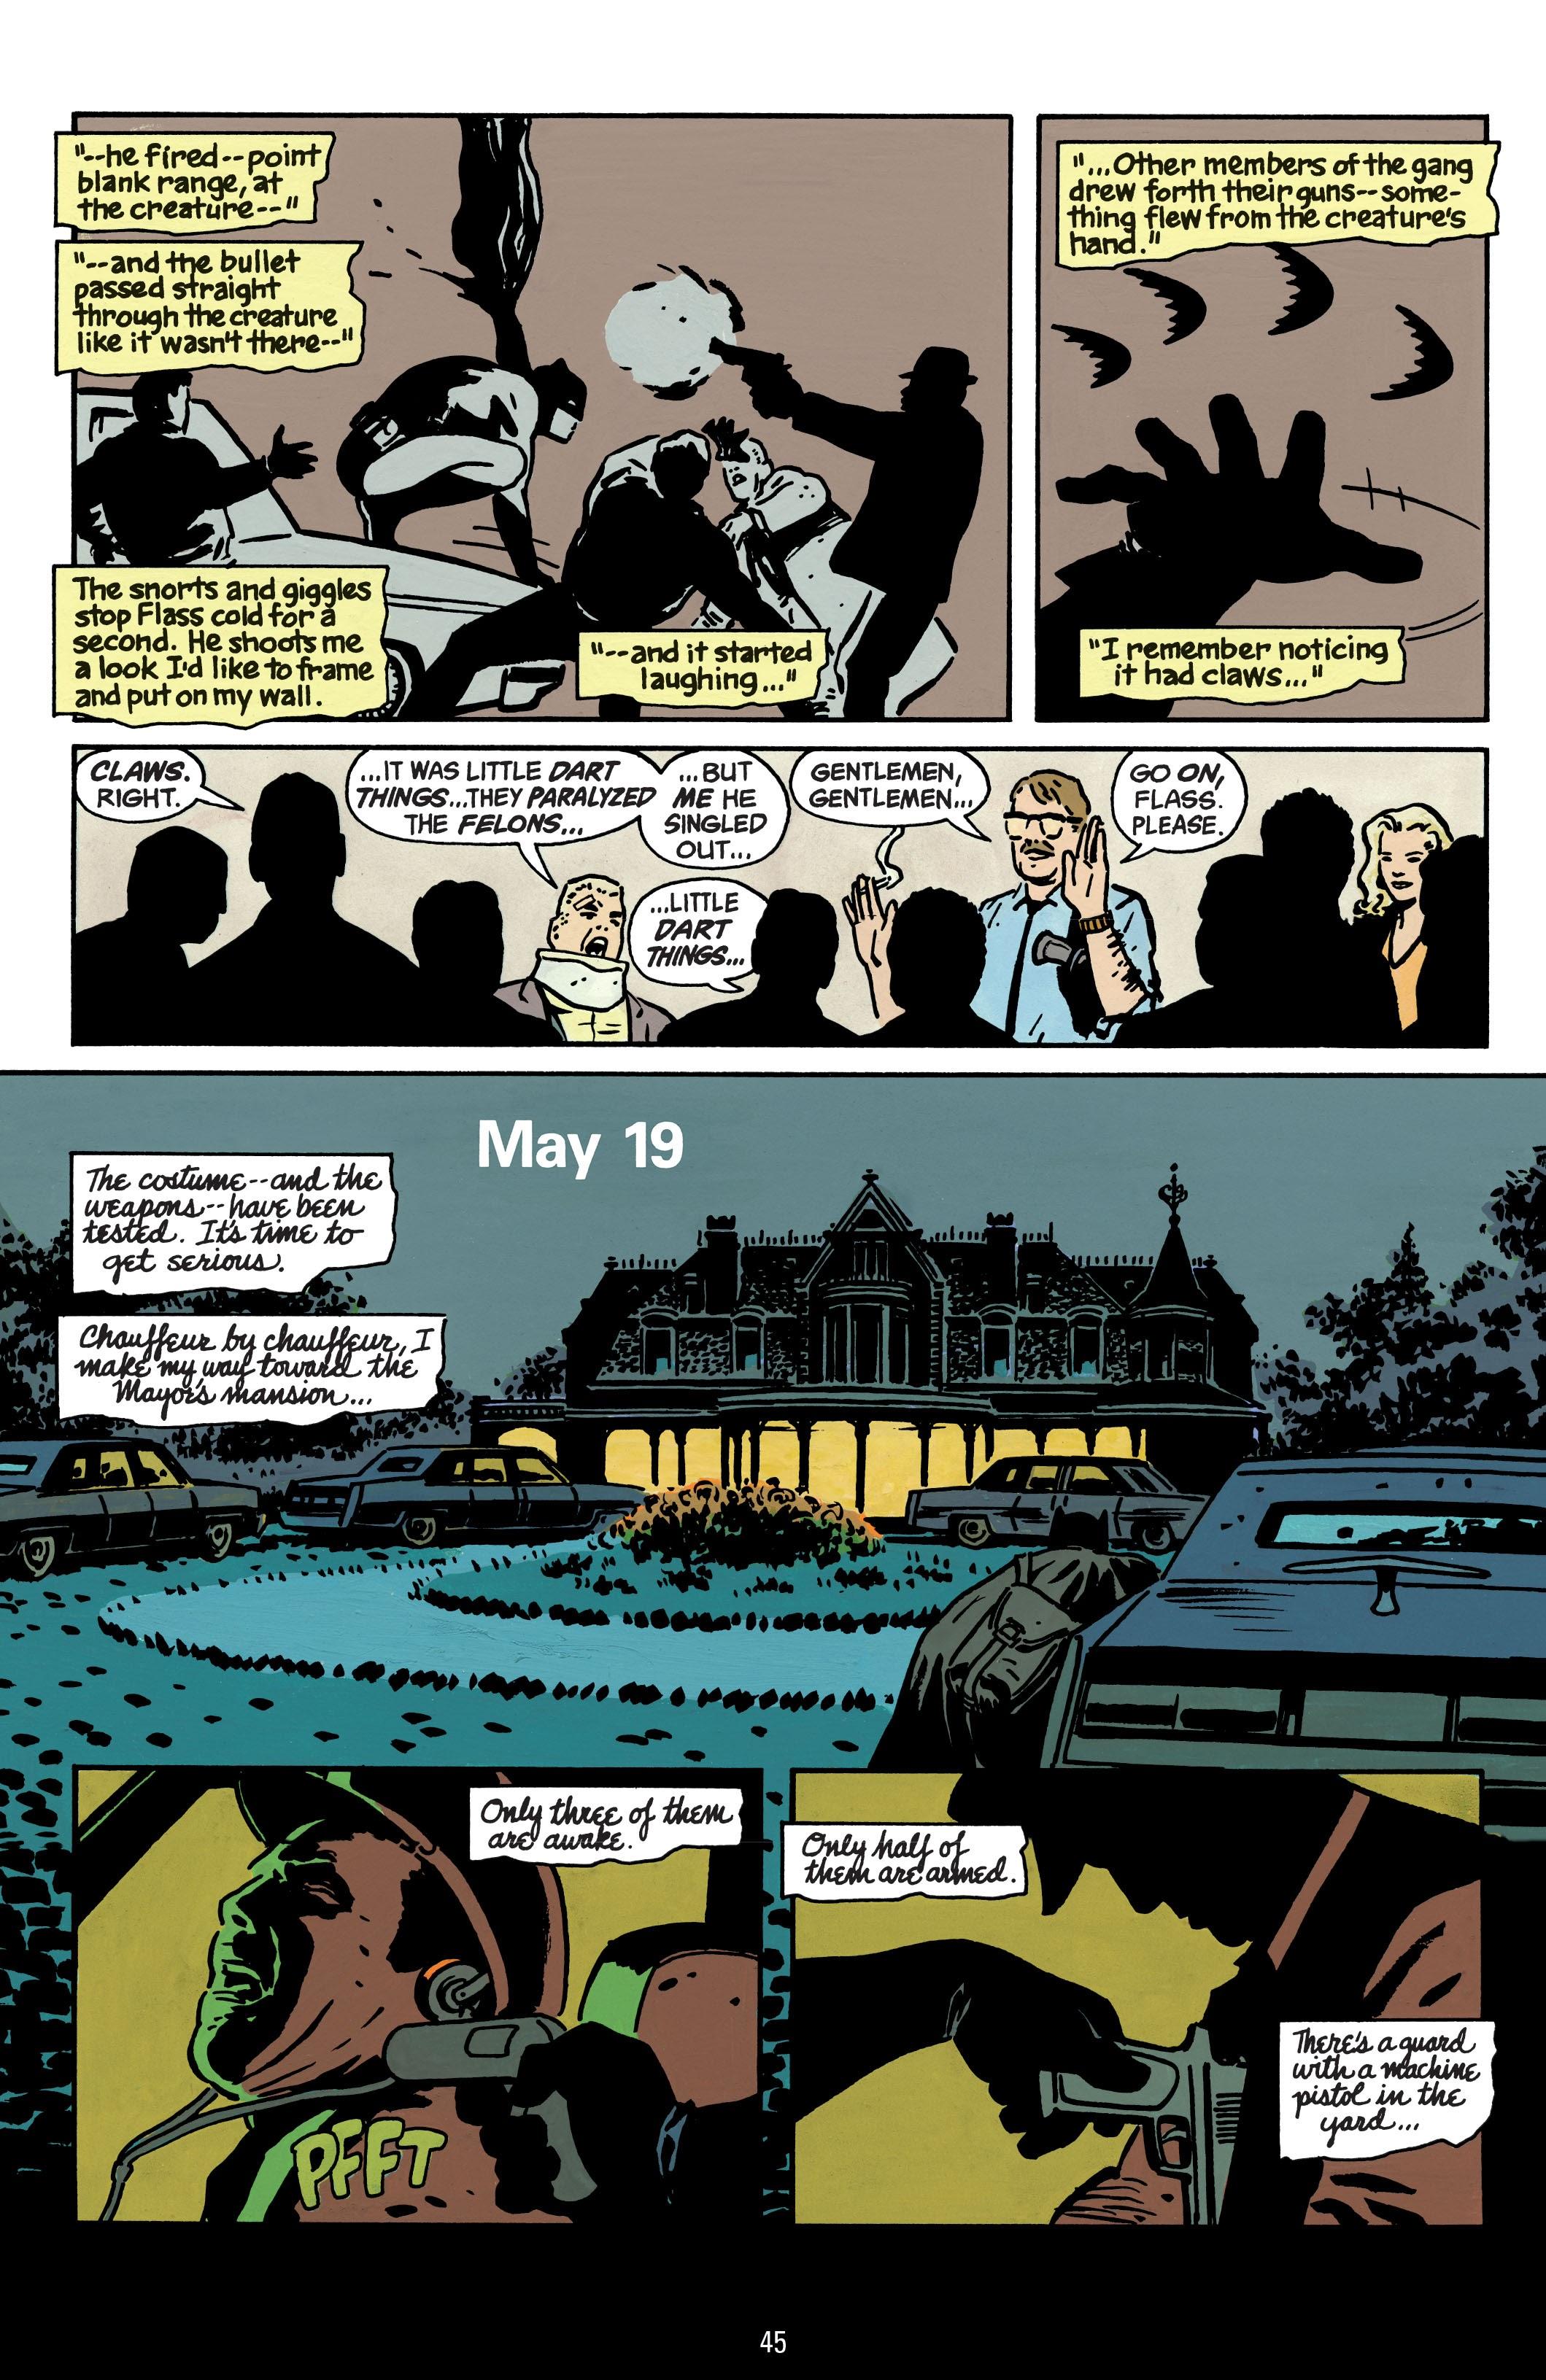 Psychology of Bruce Wayne 0cNUGIN8aDBagxL2nFARQXuzfM2gFfUjGMcfzIYcGTRGdqm39SoUKiRnOkYPxa20thDsnZJElvCYGb6YOKbJ0khSKxyO6EEop83tKtMujks4K1JPnMKeQHkmYbyAt5TpPtpCZMLWOA=s0